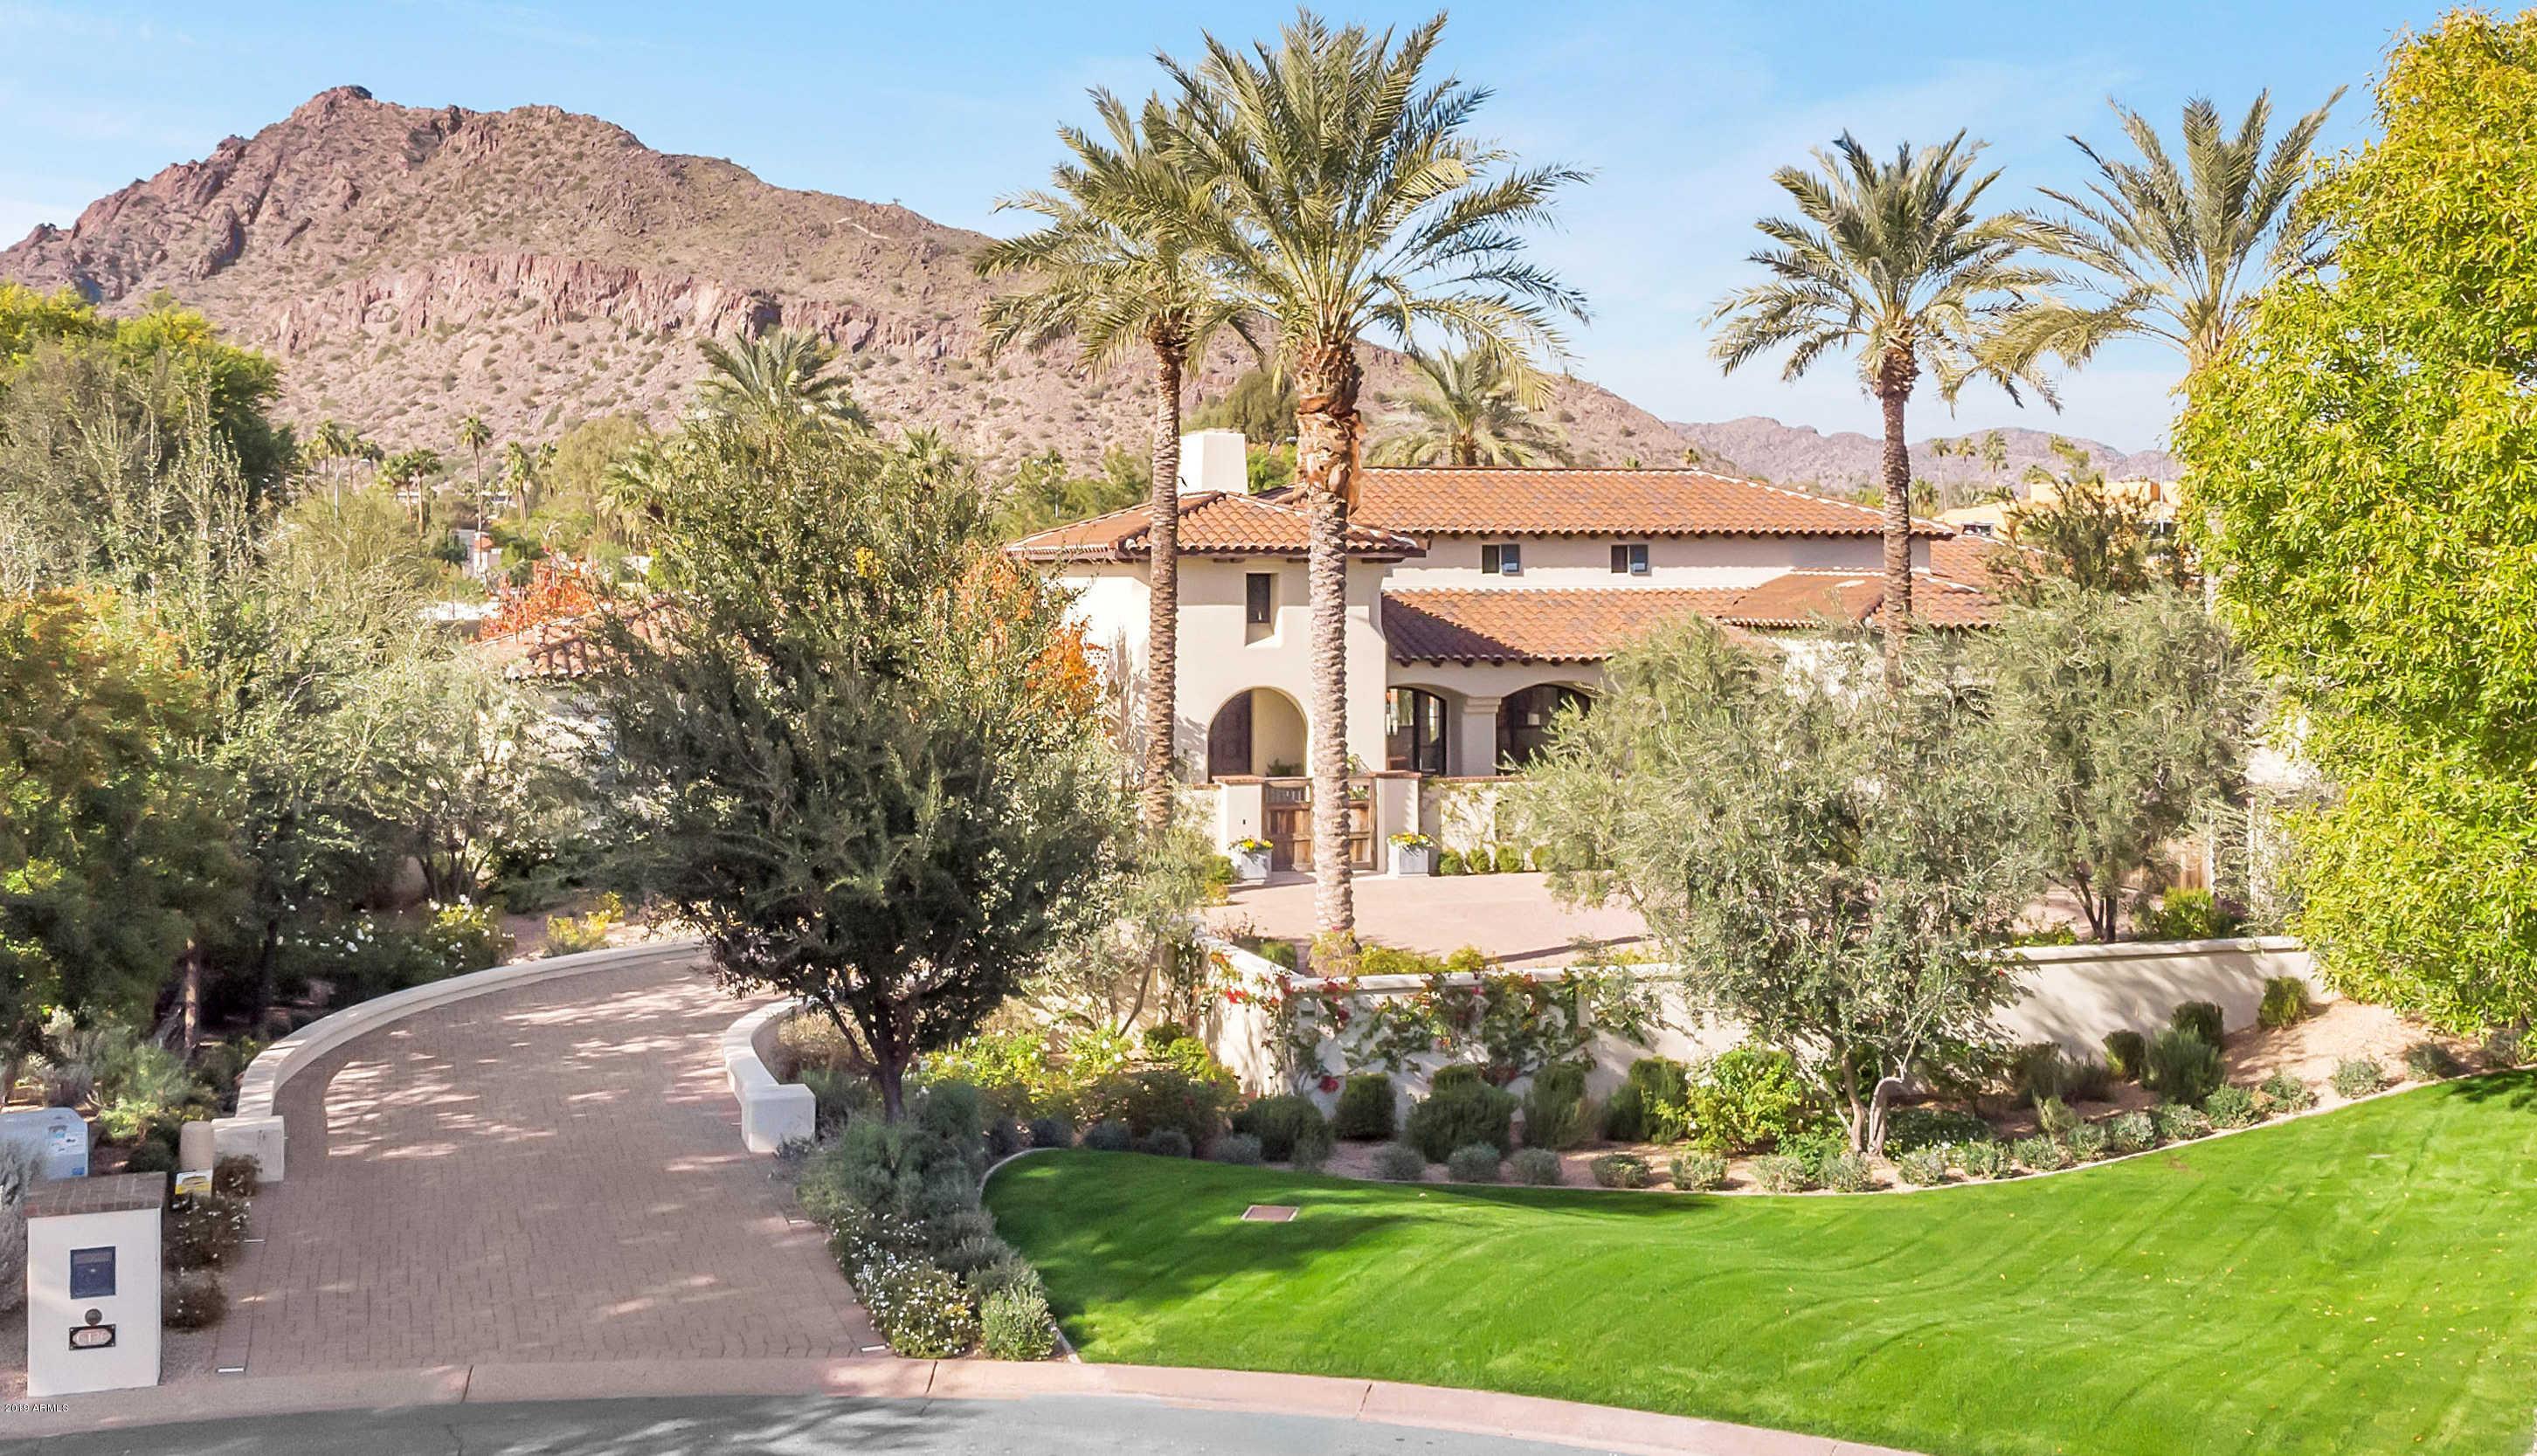 $3,500,000 - 4Br/5Ba - Home for Sale in 6500 Camelback, Scottsdale